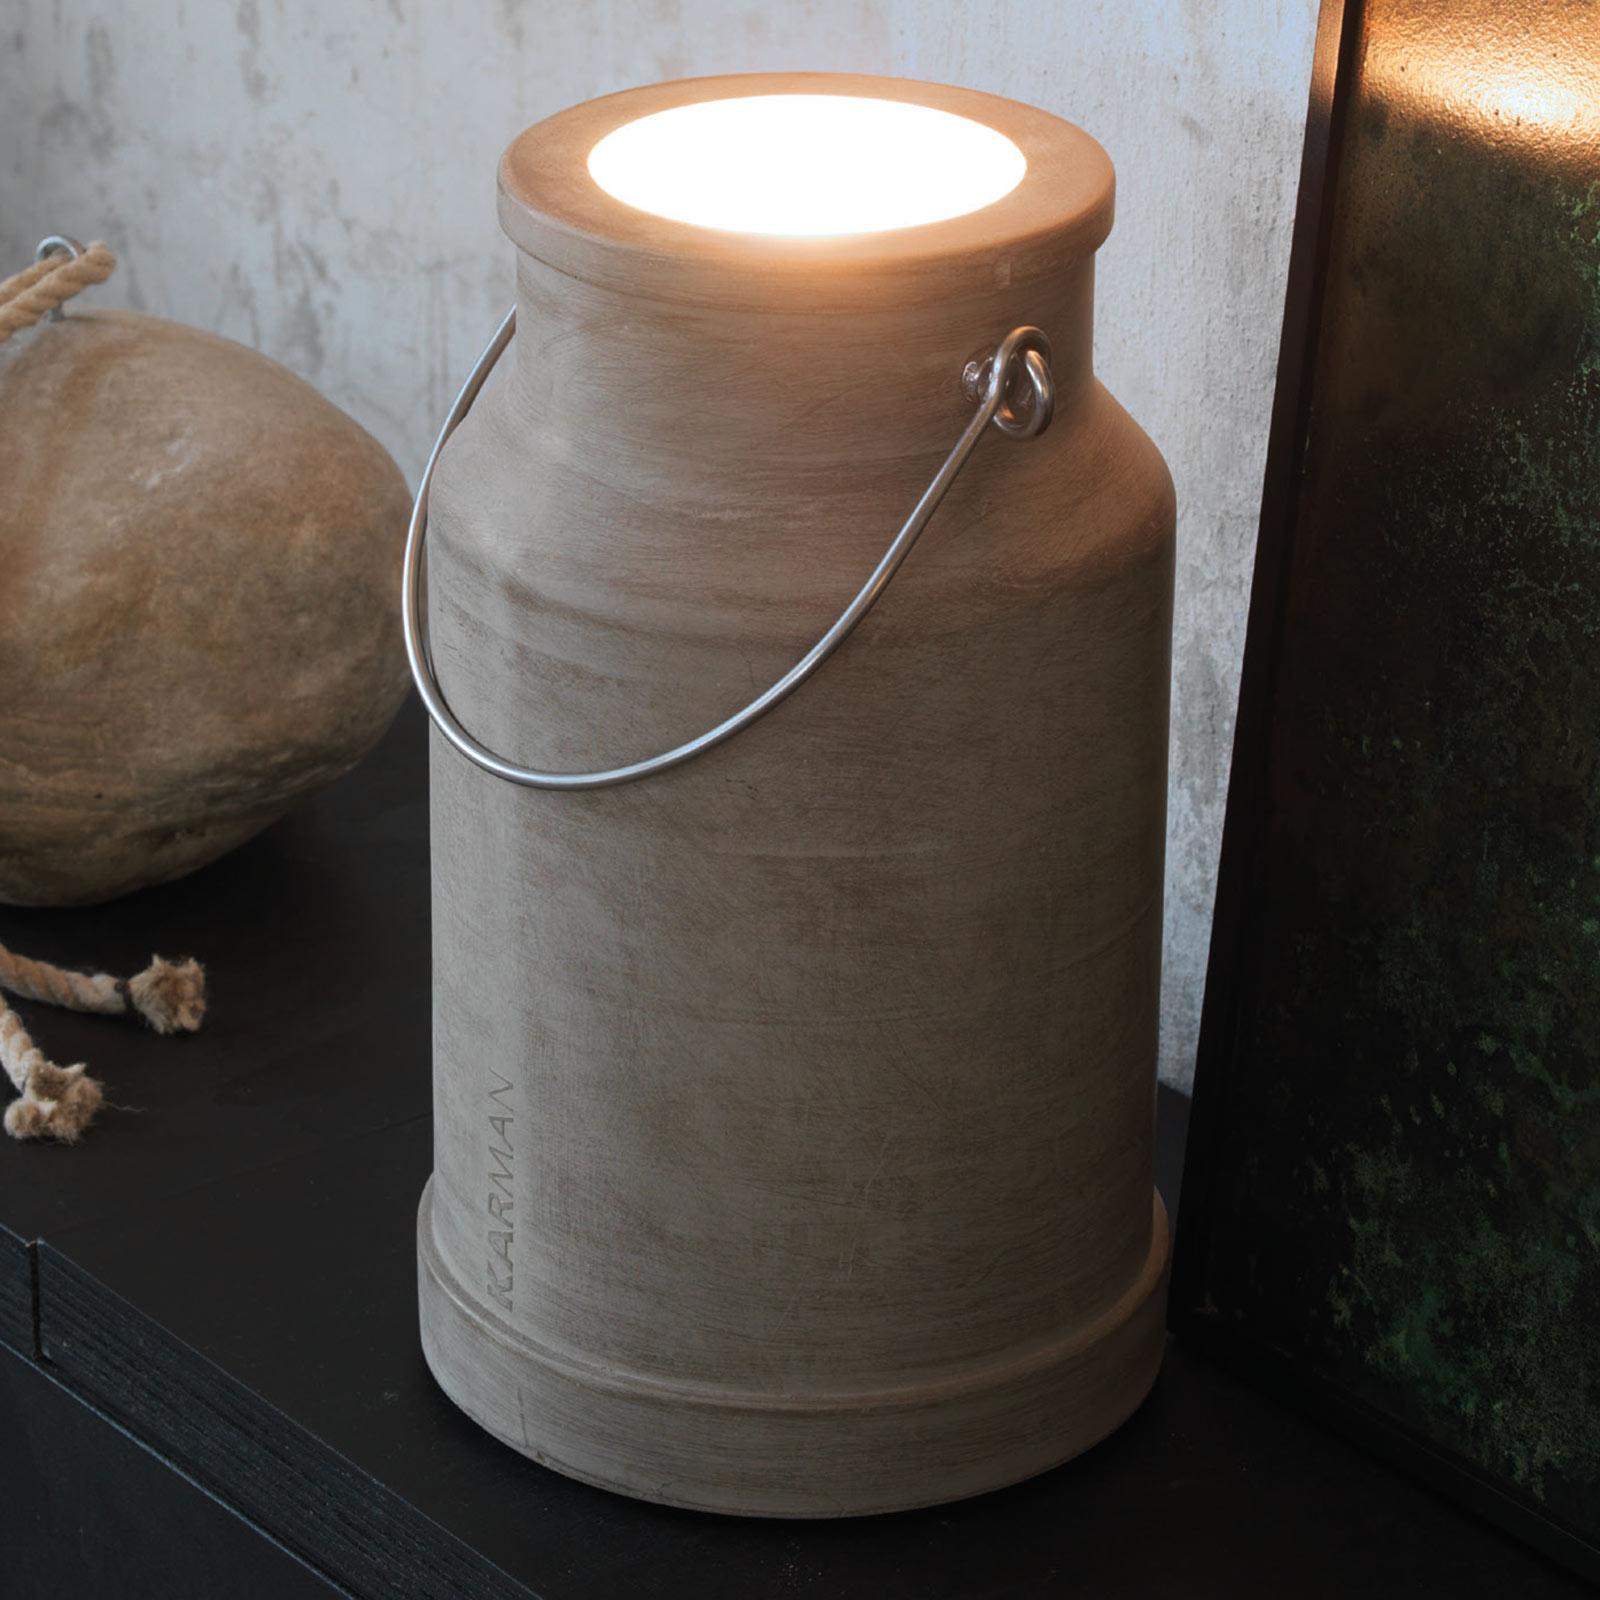 Karman Via Lattea - buiten-vloerlamp met handgreep